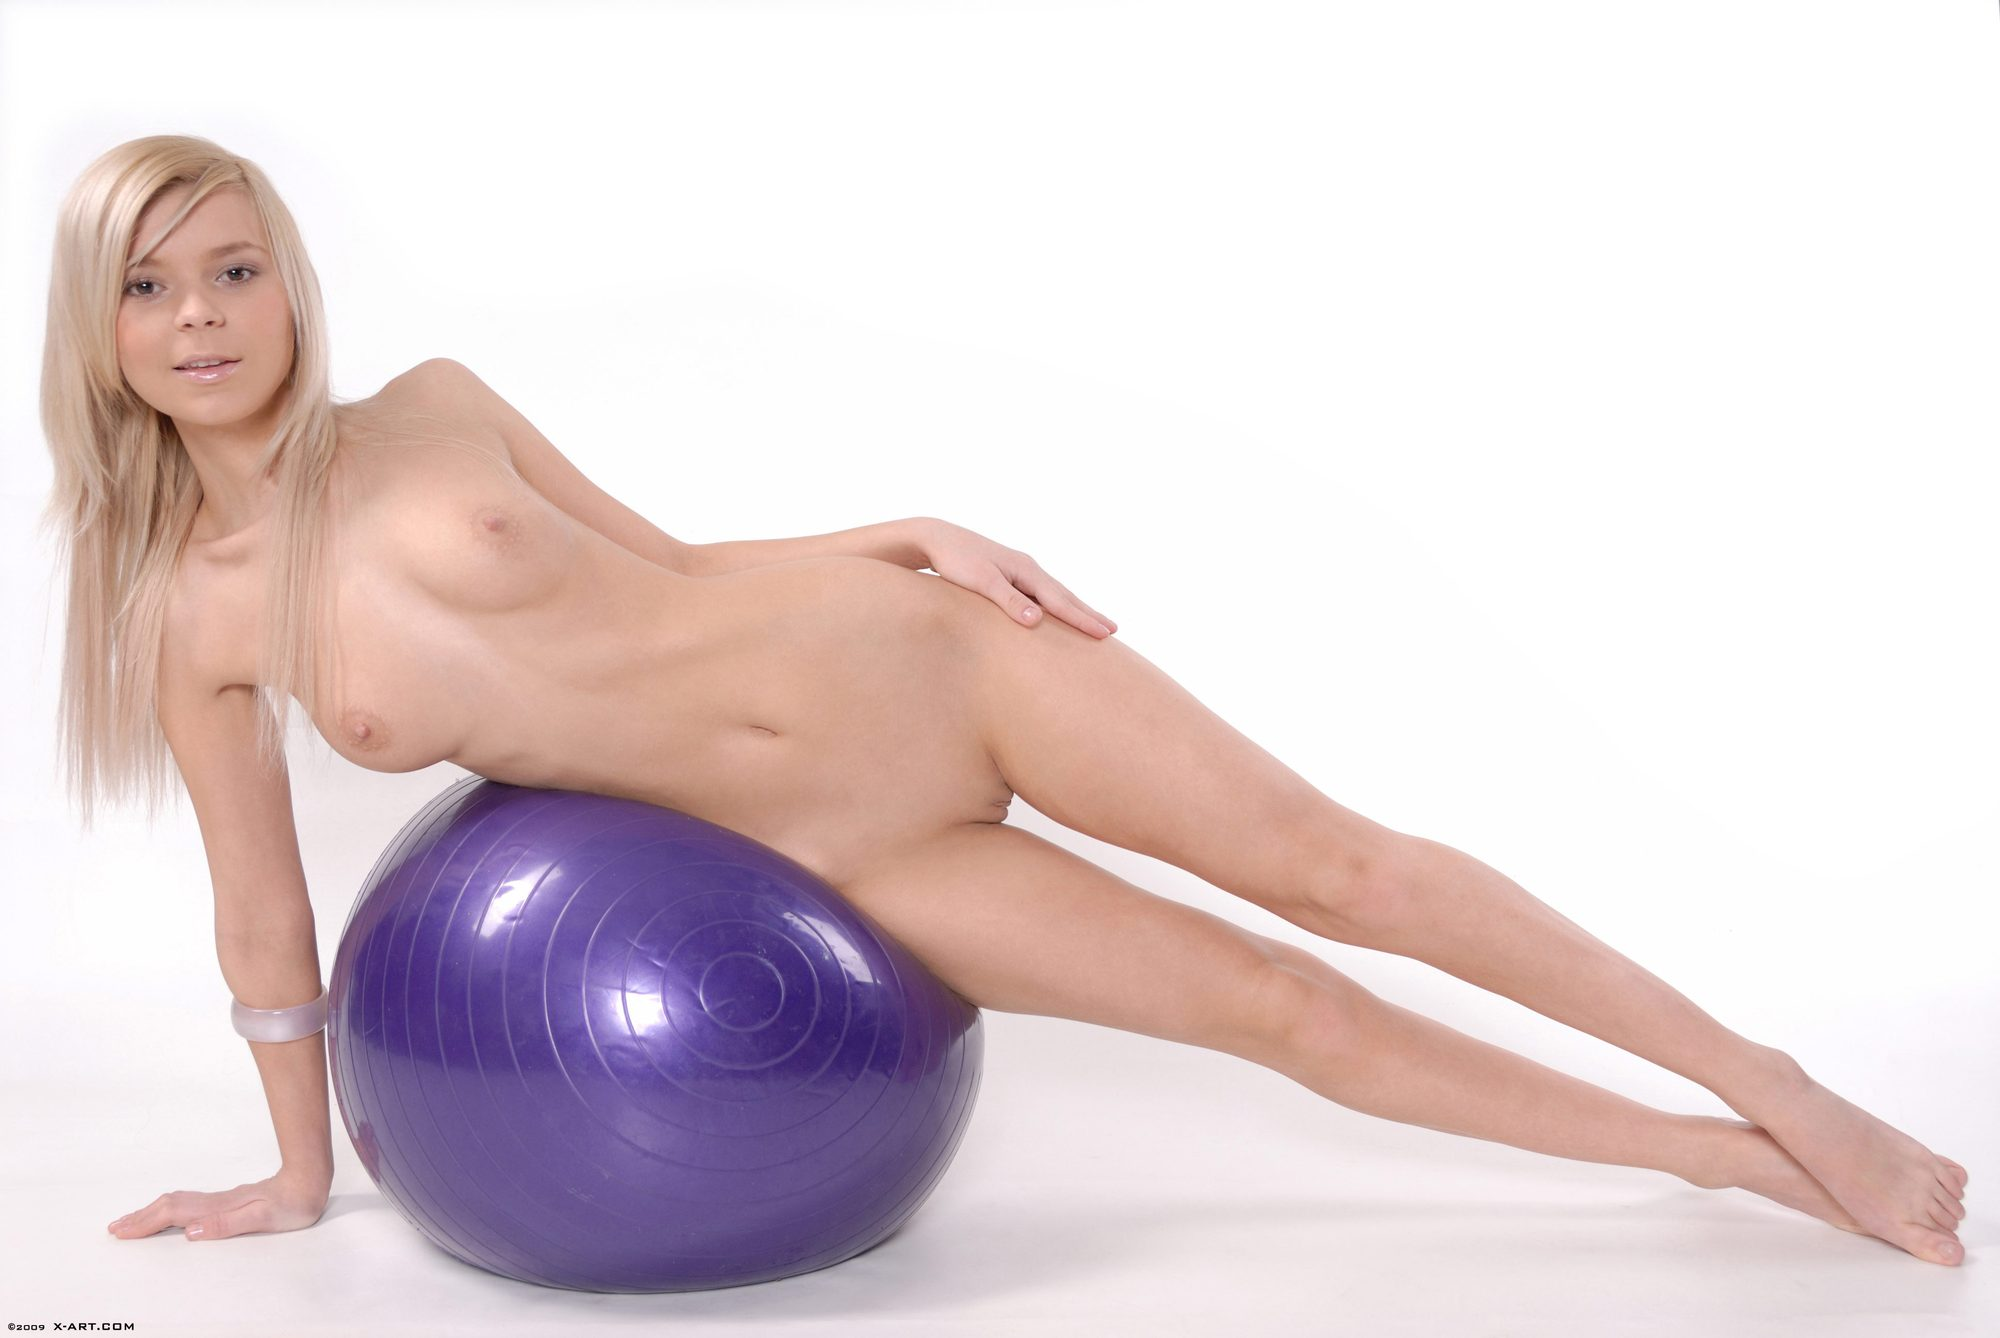 Rubia hermosa hace gimnasia desnuda